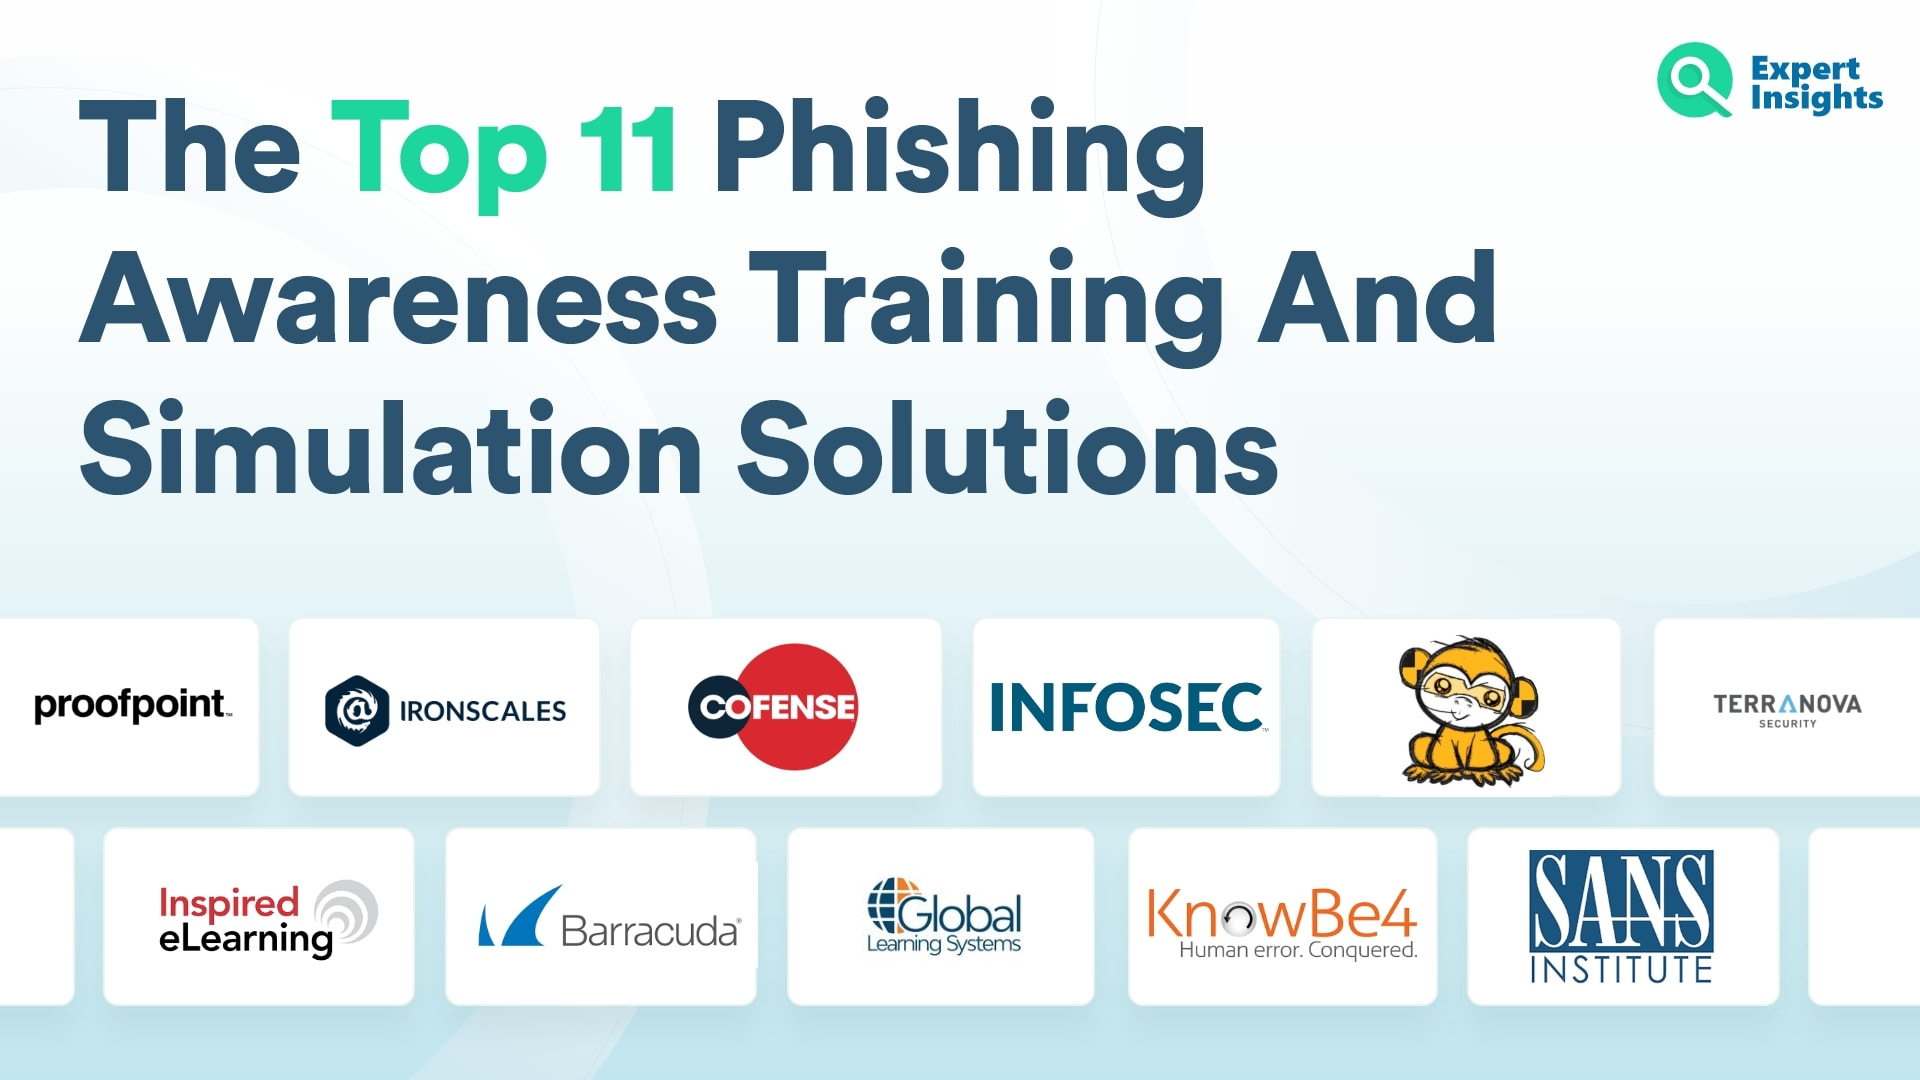 Top 11 Phishing Awareness Training And Simulation Solutions